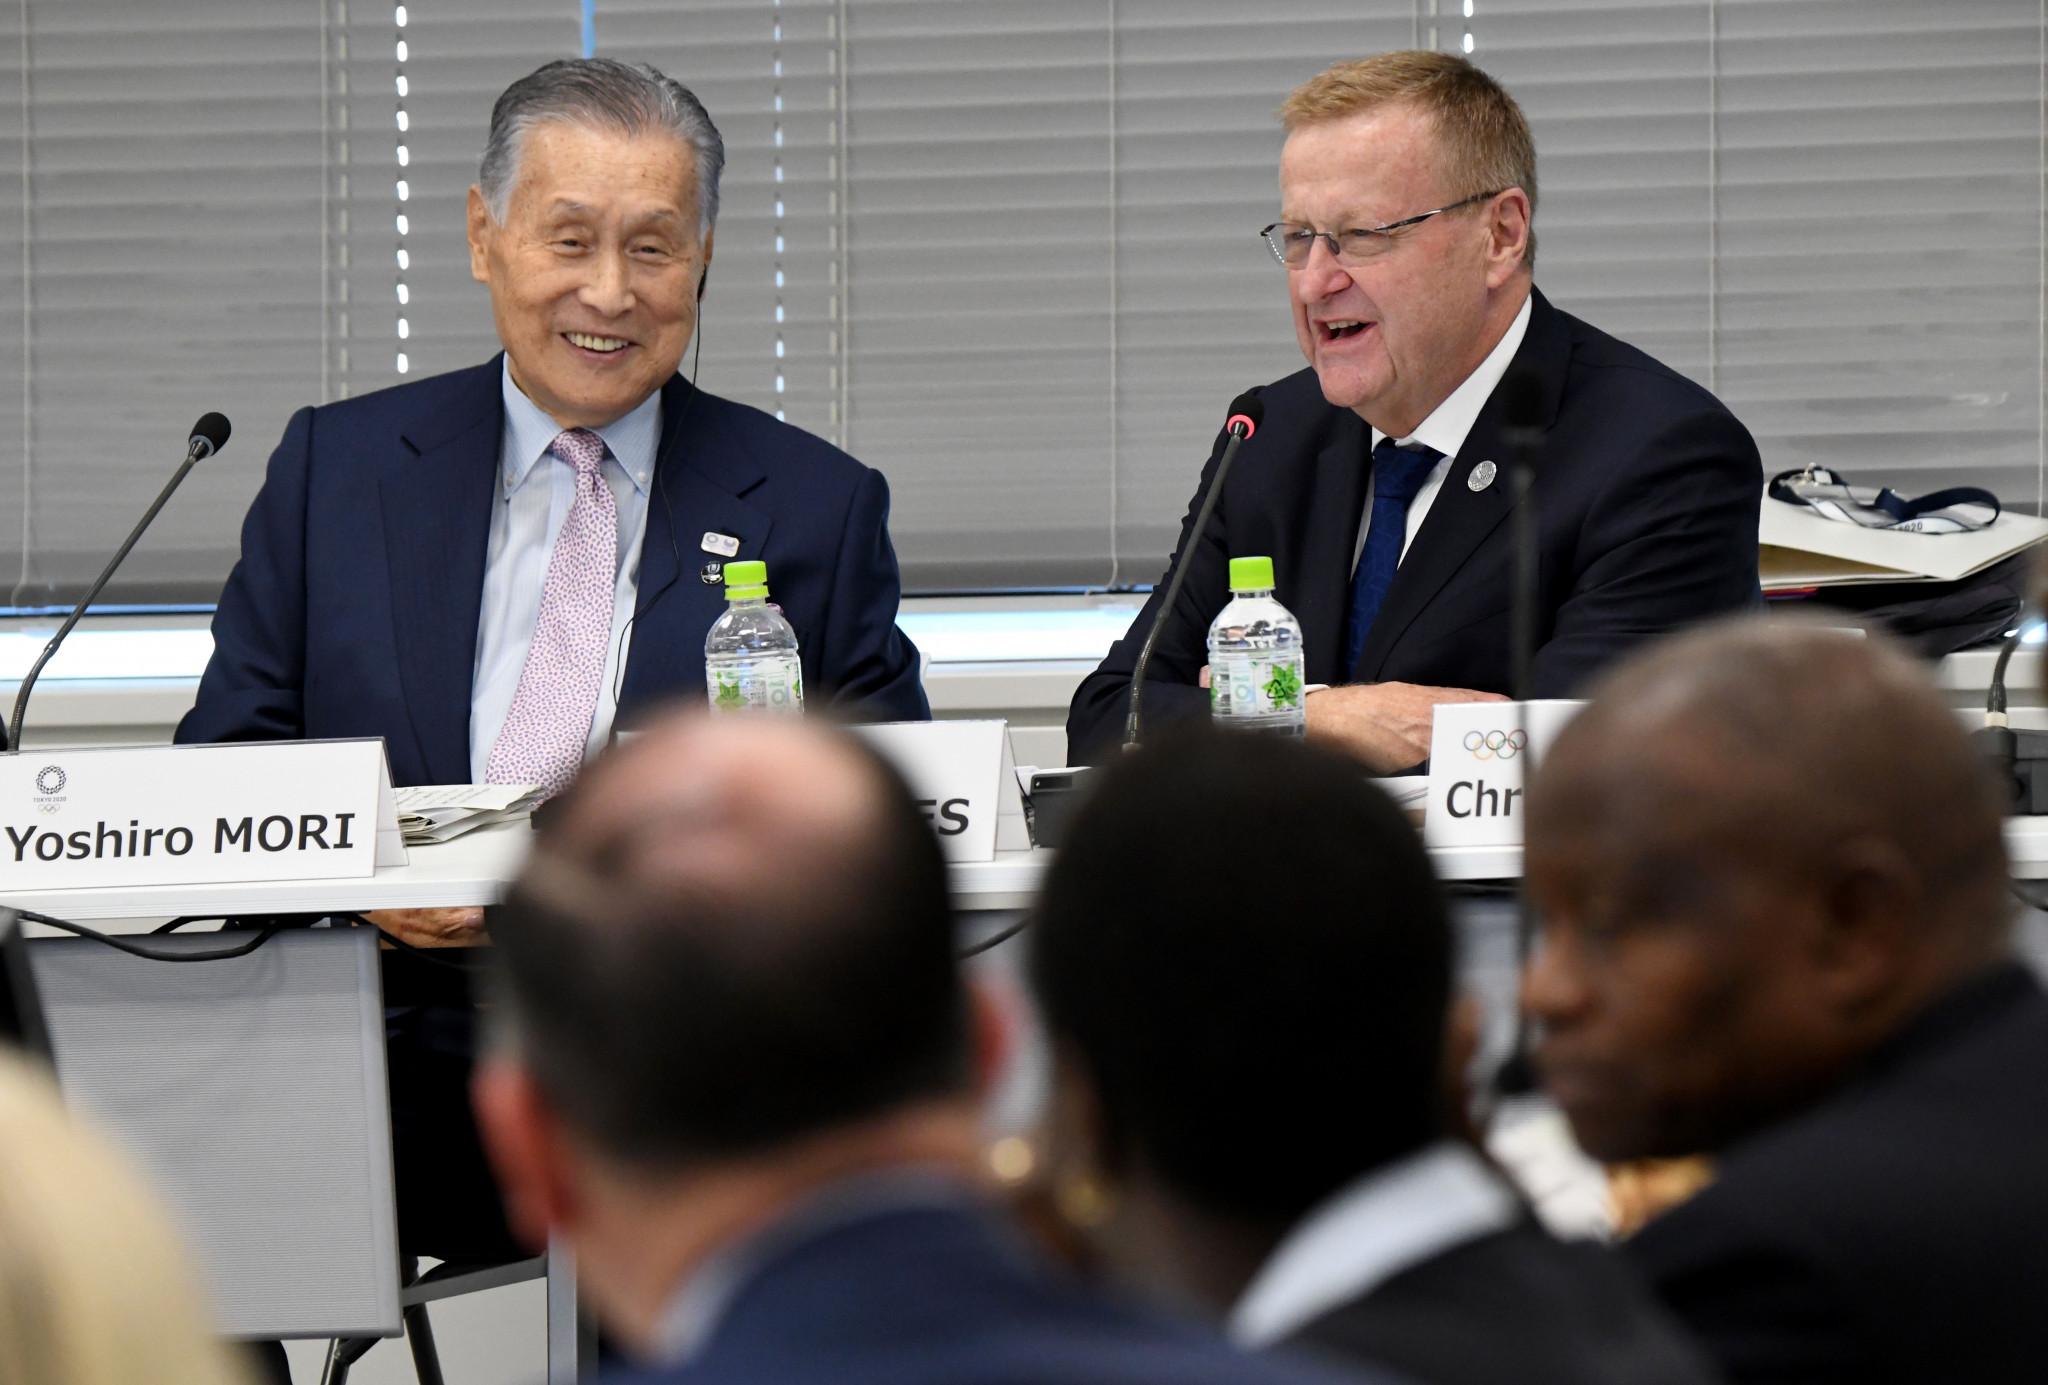 IOC Coordination Commission begin visit as schools begin Tokyo 2020 mascot vote